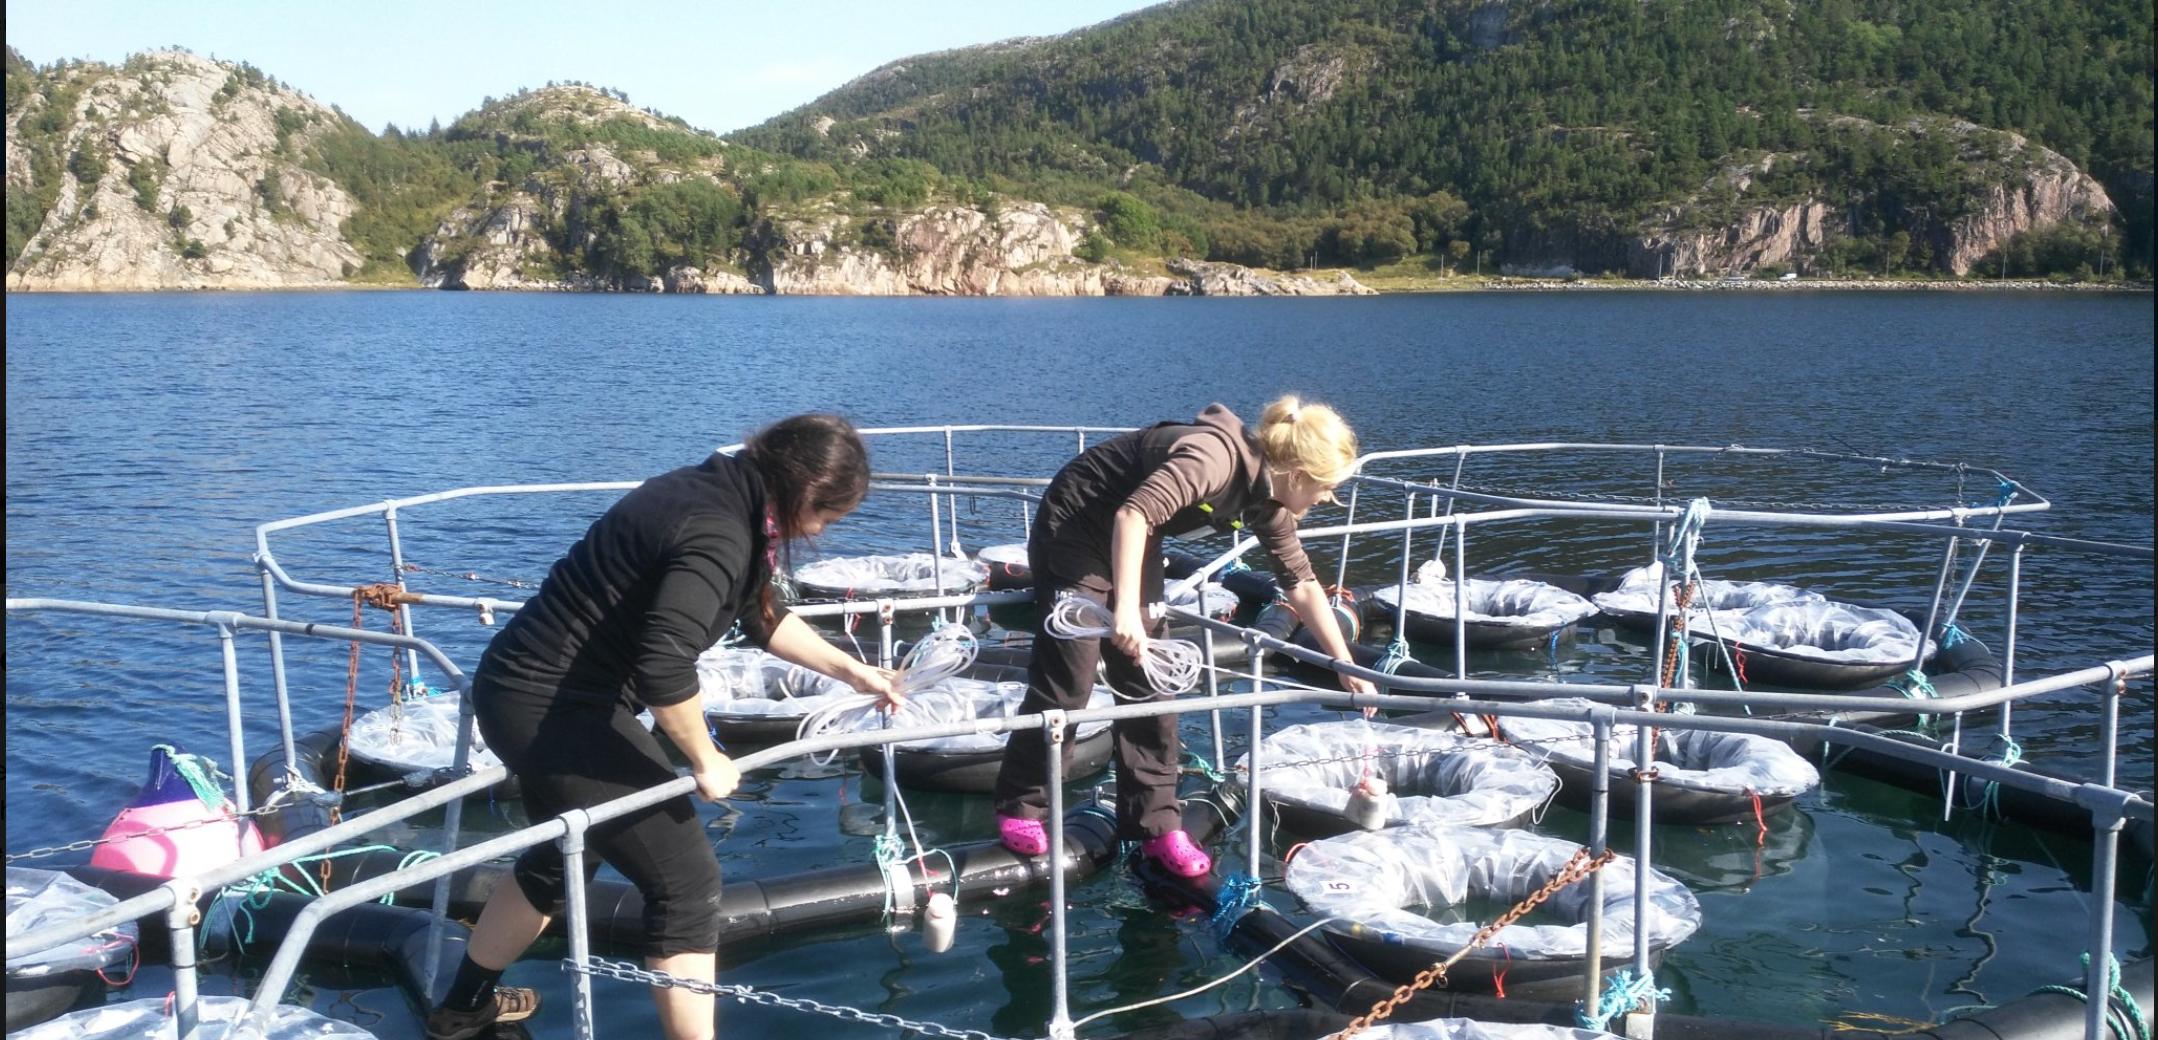 Picture 4 : Mesocosm bags after deployment © M. M. Stockenreiter, Luna Benitez Requena, Sabine Schultes and Patrick Fink